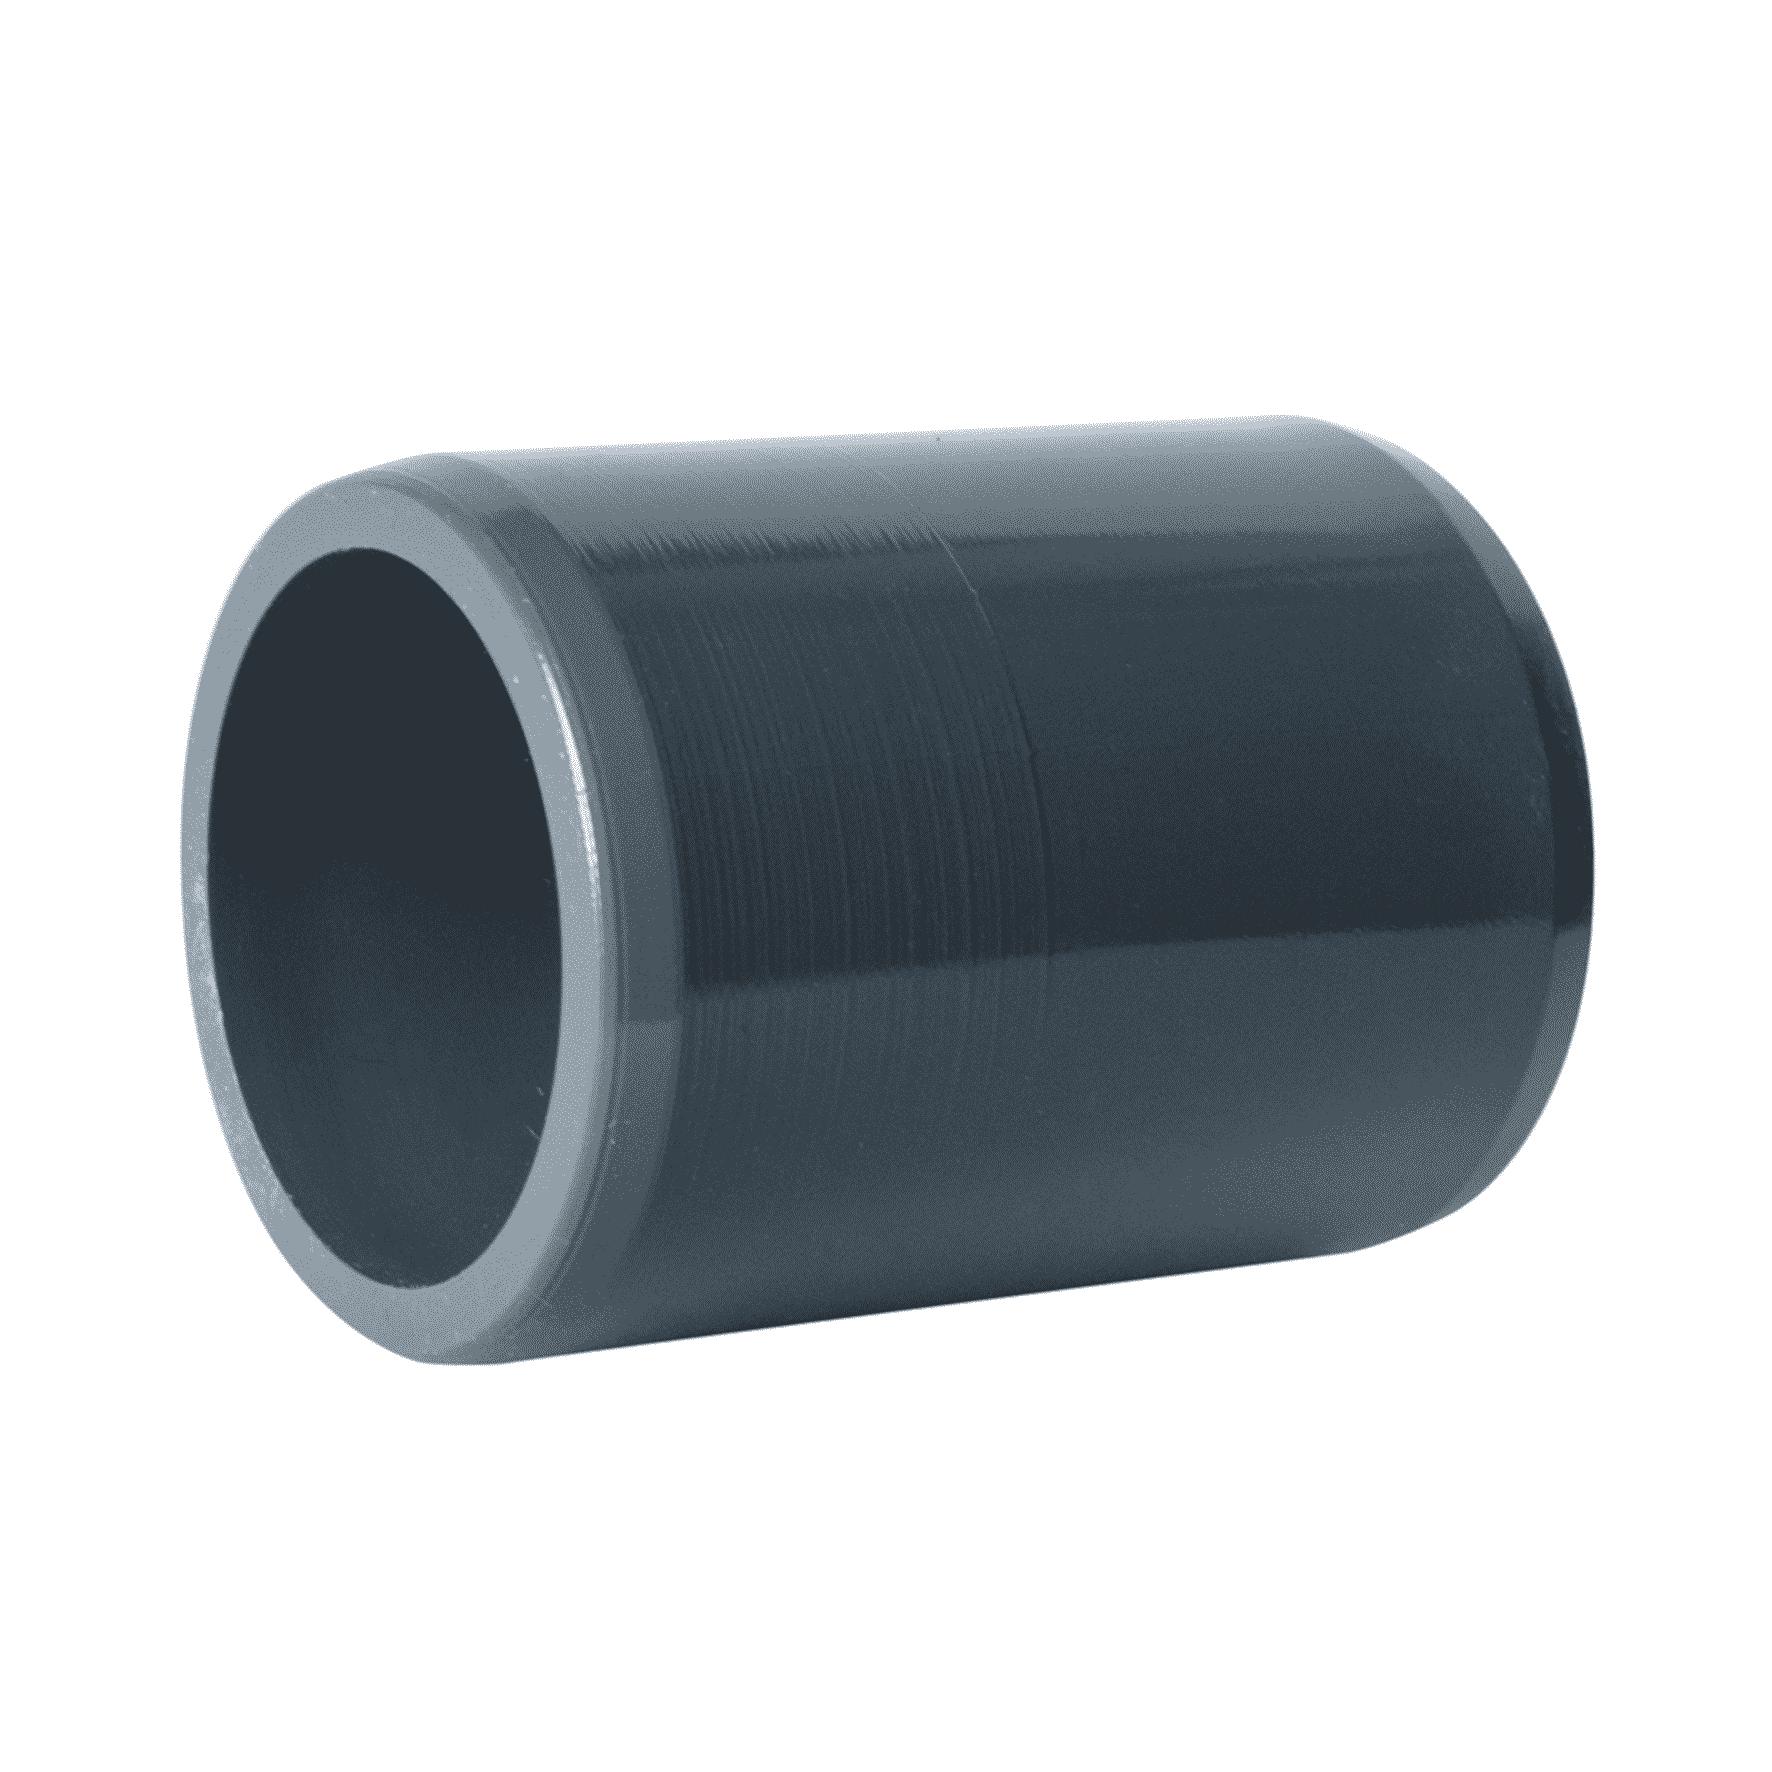 PVC-U manicotto maschio - EFFAST - 100% Made in Italy